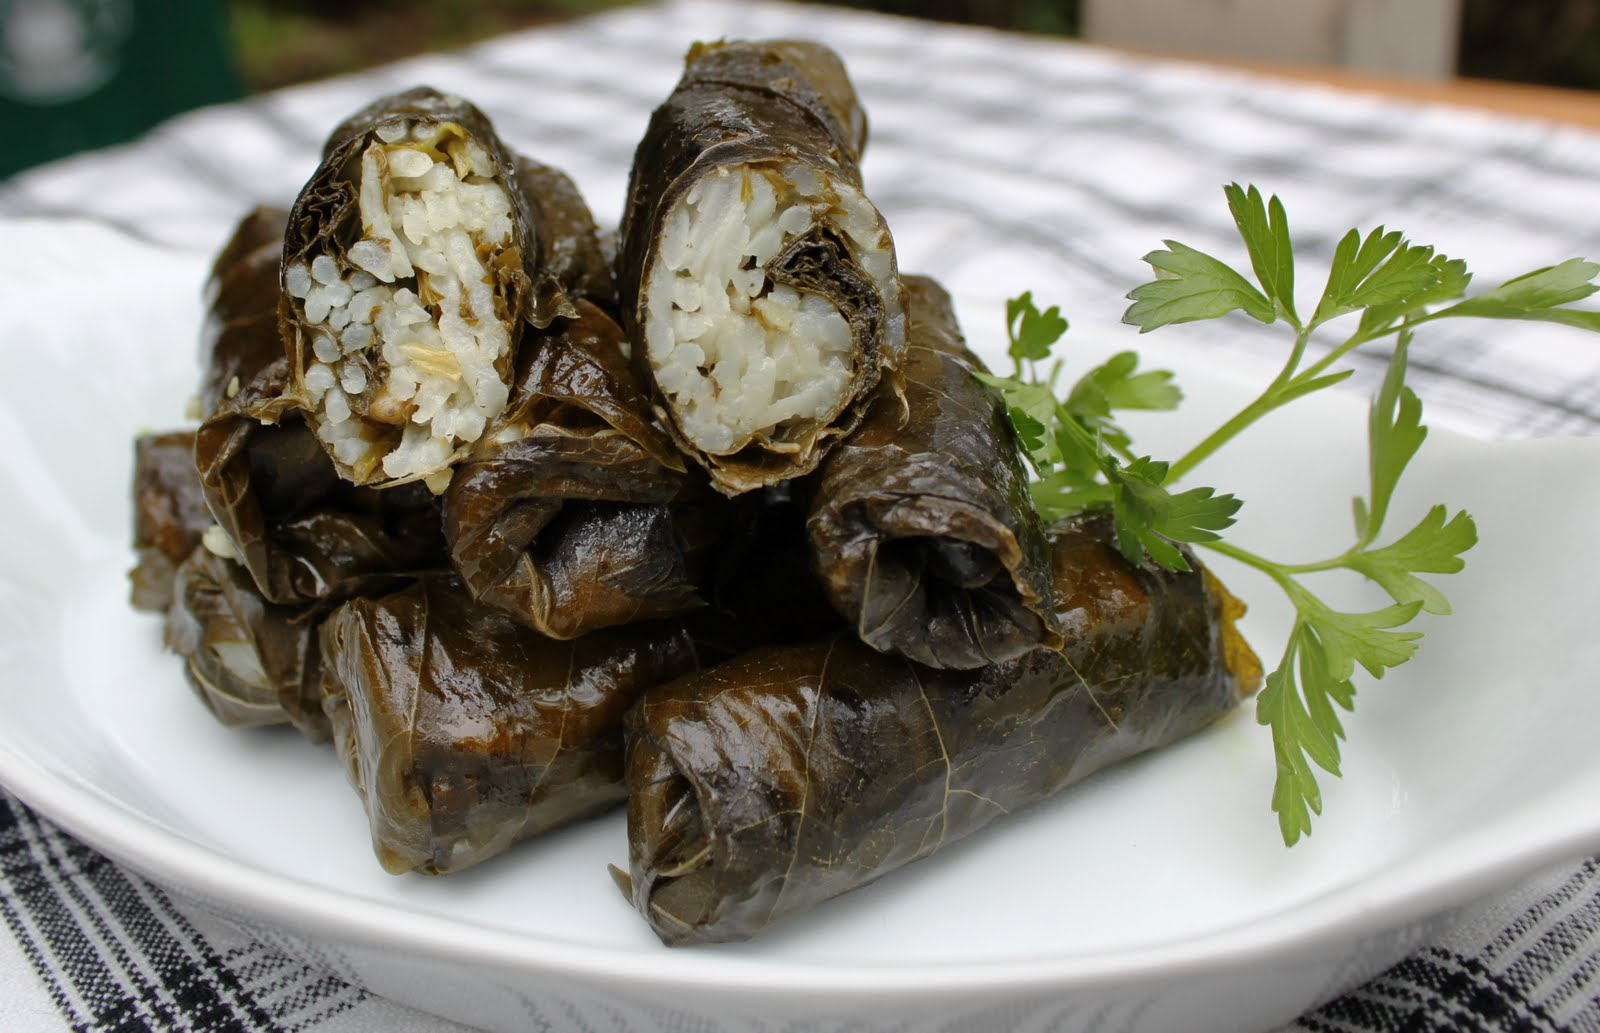 Weekly Vegan Menu: Sunday Lunch - Dolmas (September 19)